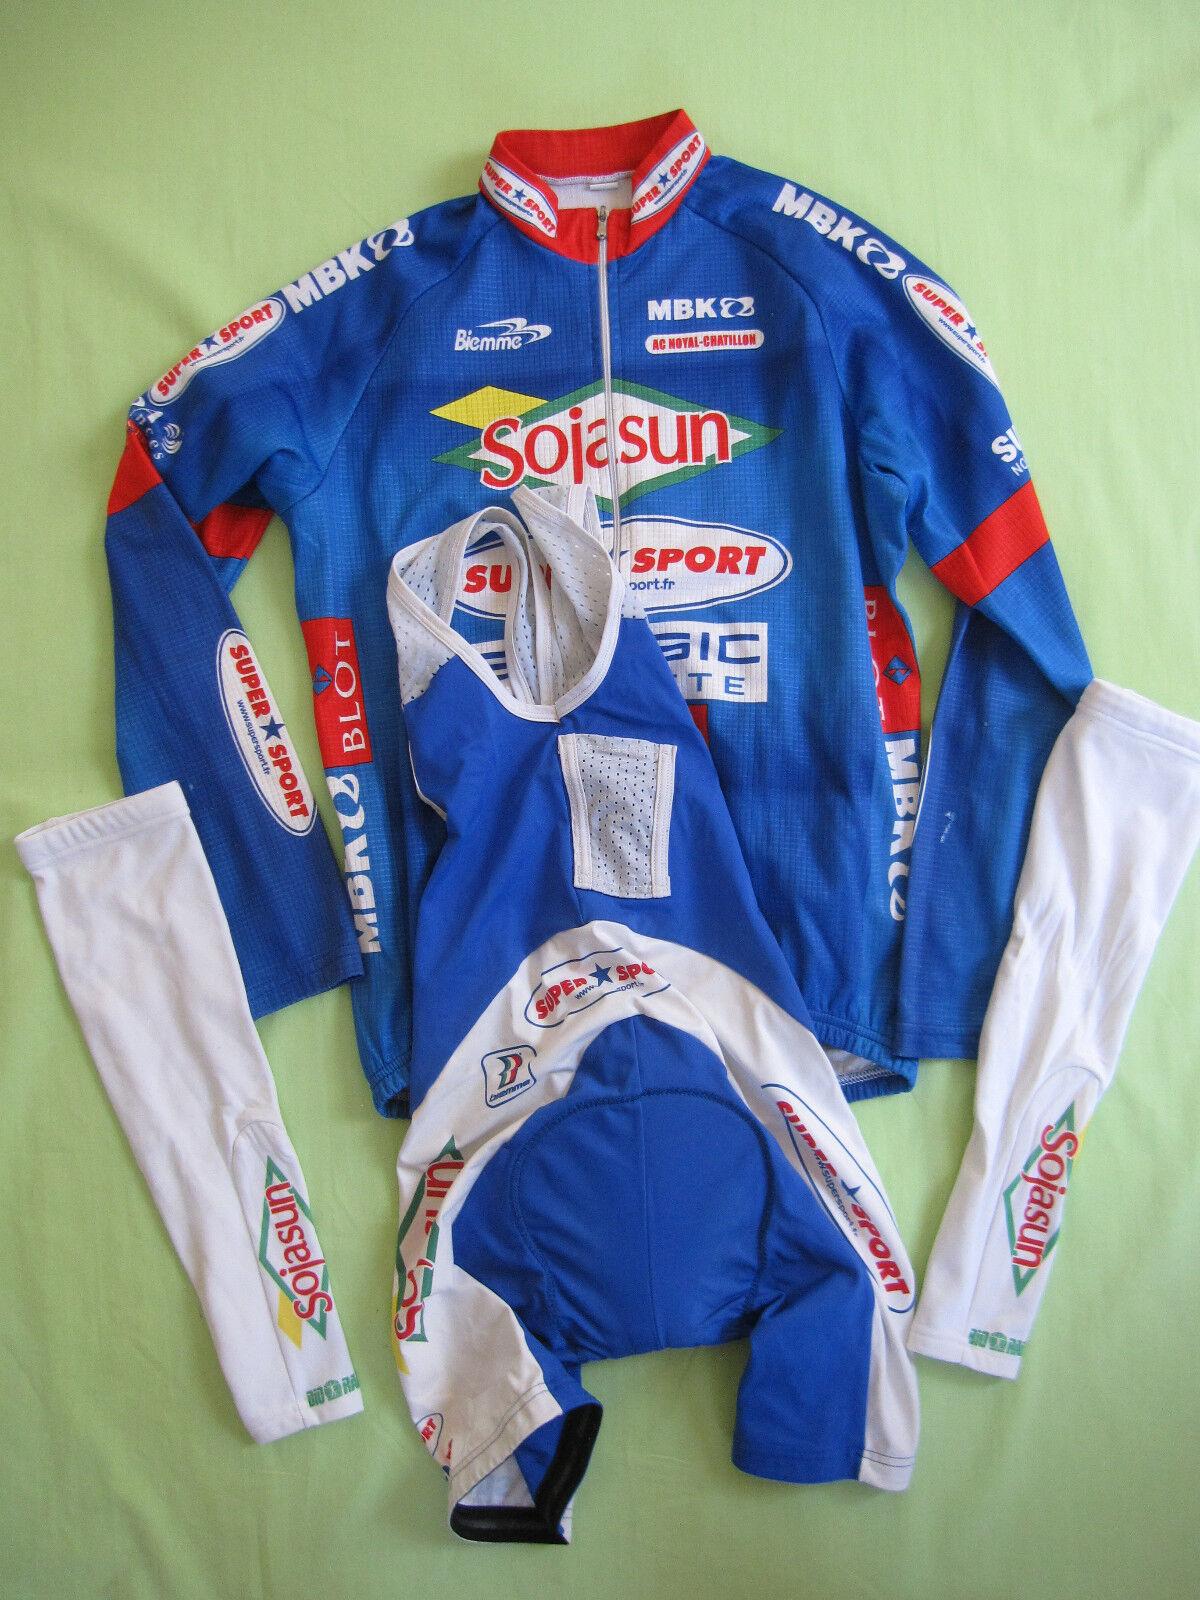 Cuissard cycliste Soja sun + Manchettes + Veste Ac Noyal Chatillon Pro - 3   M